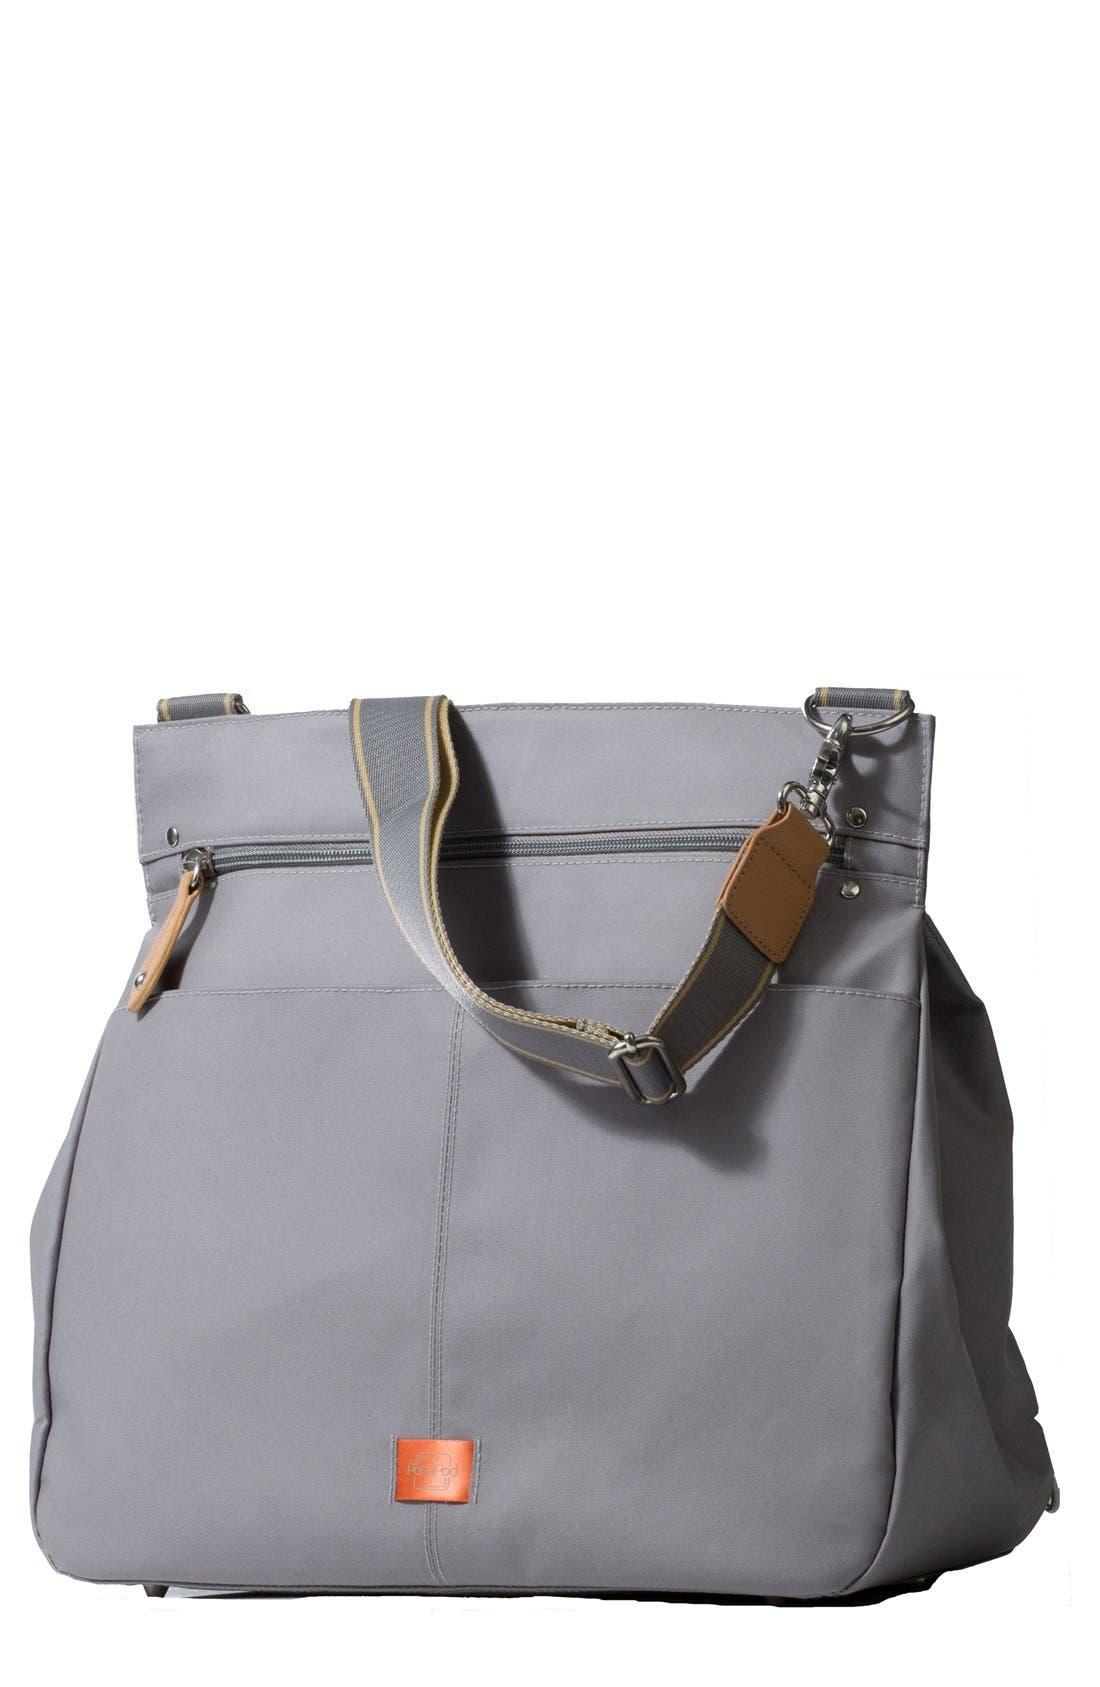 'Oban' Diaper Bag,                             Main thumbnail 1, color,                             ELEPHANT